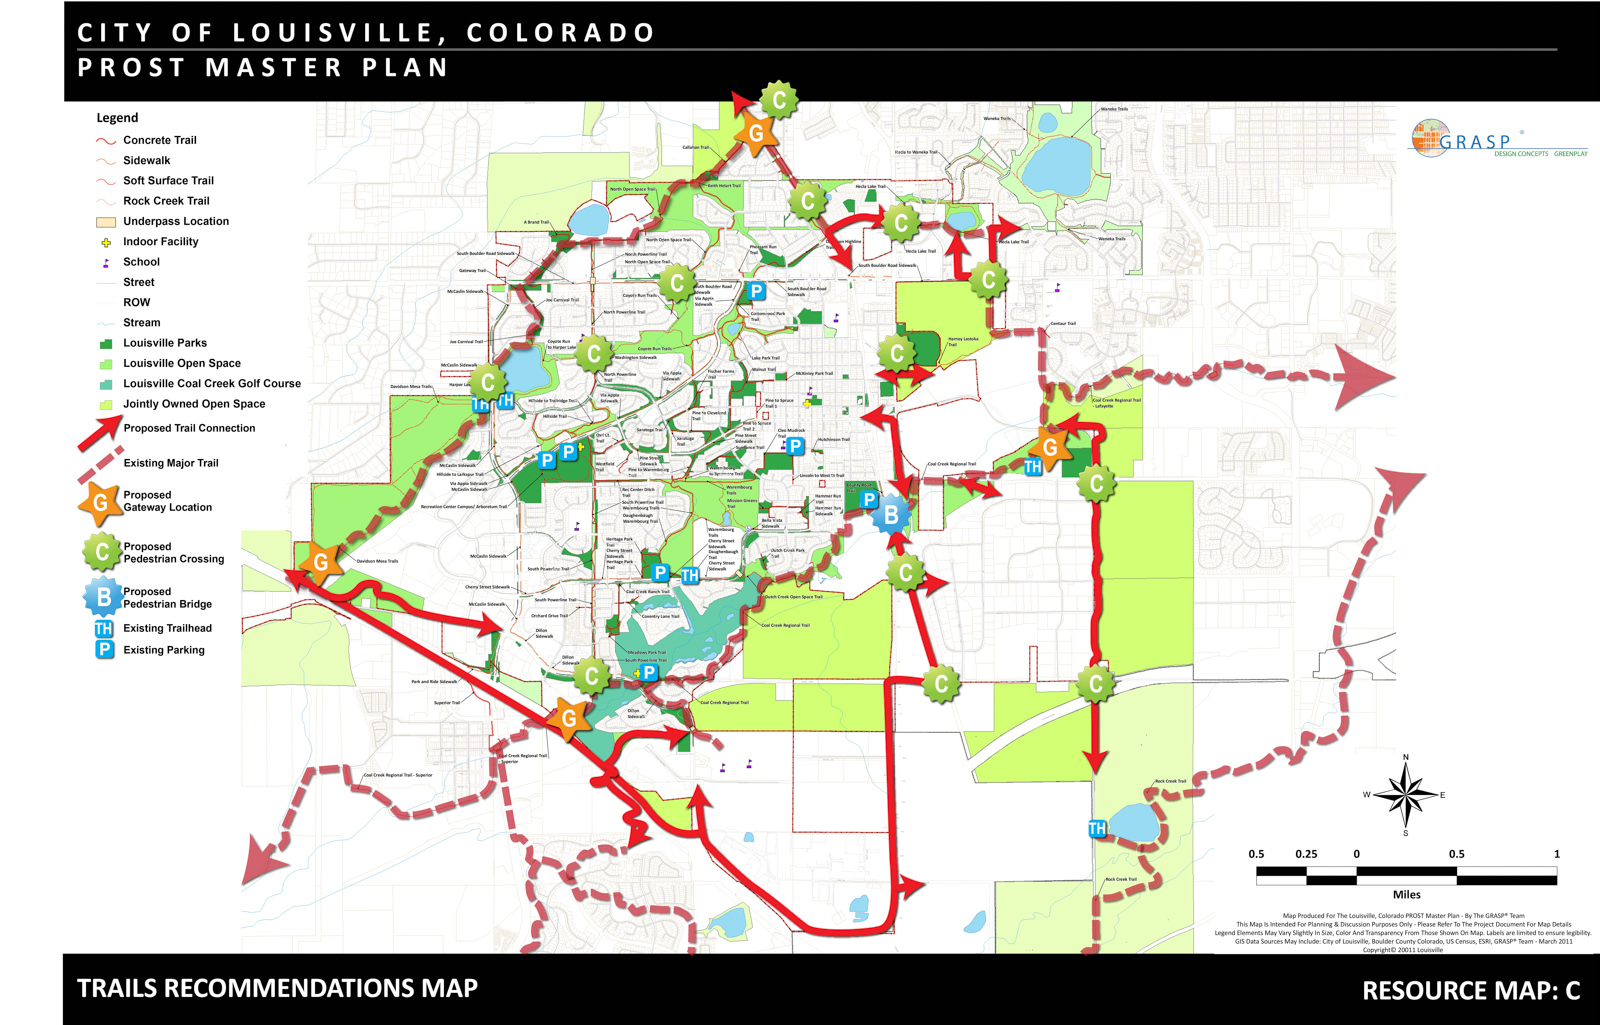 21042-Louisville_R_C_Trails Recommendations-11-14-11.jpg